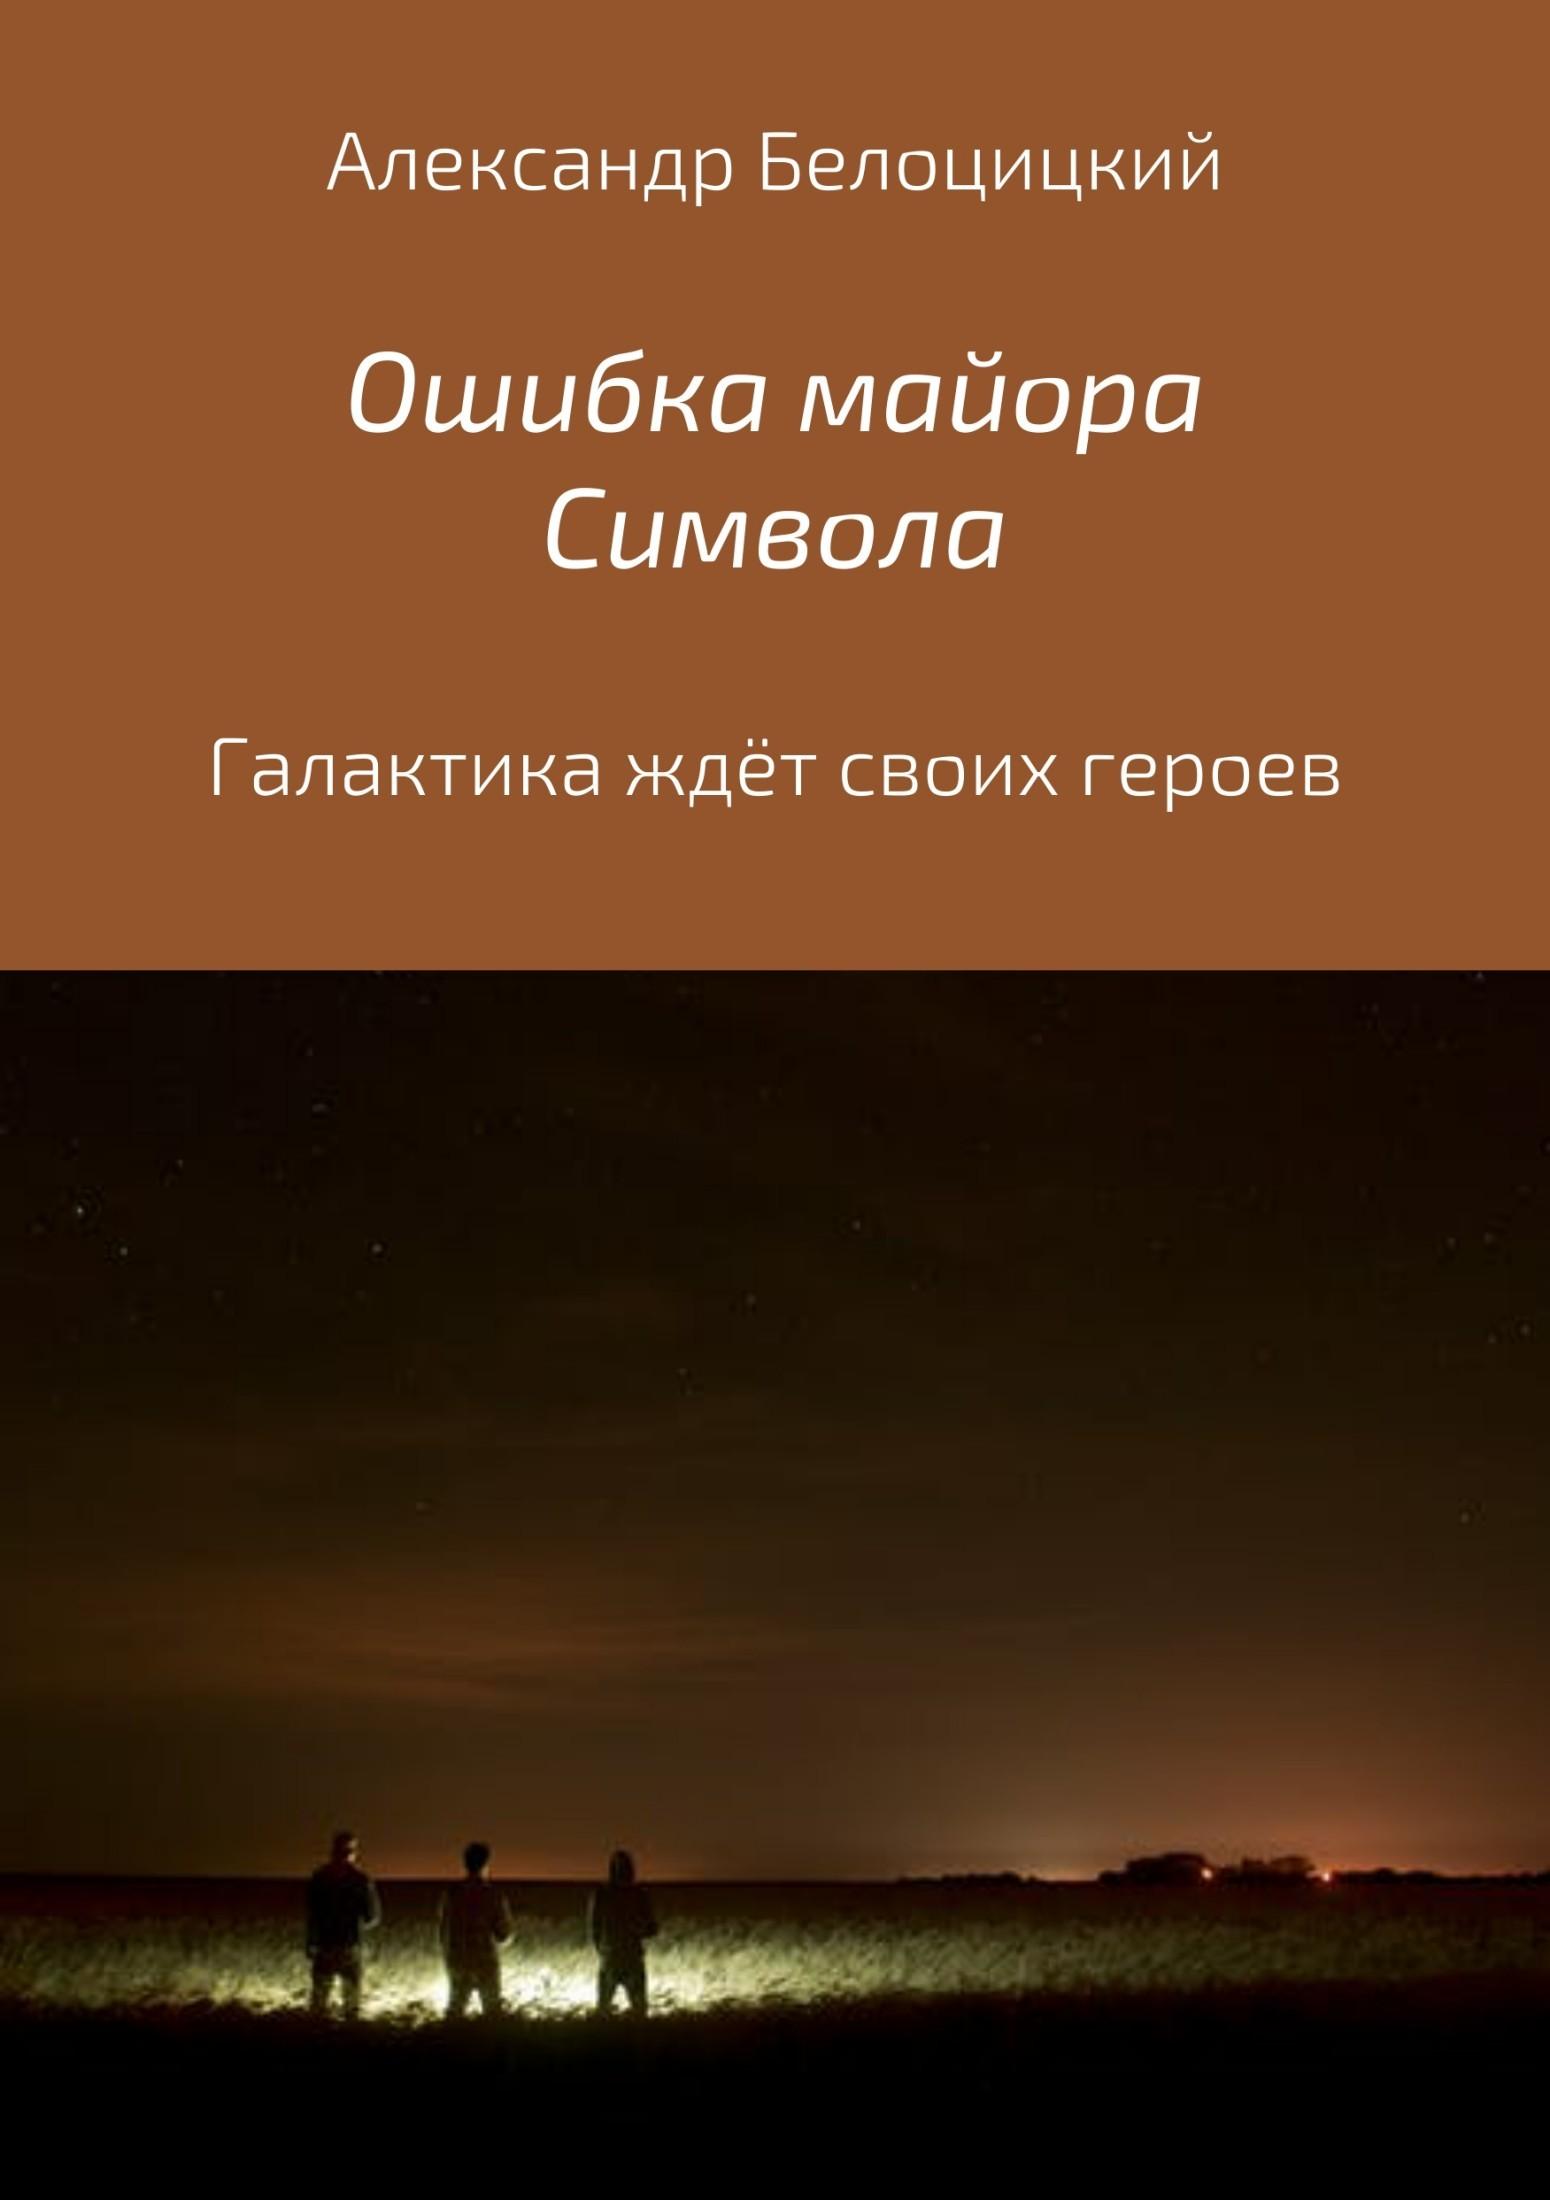 Александр Белоцицкий - Ошибка майора Символа